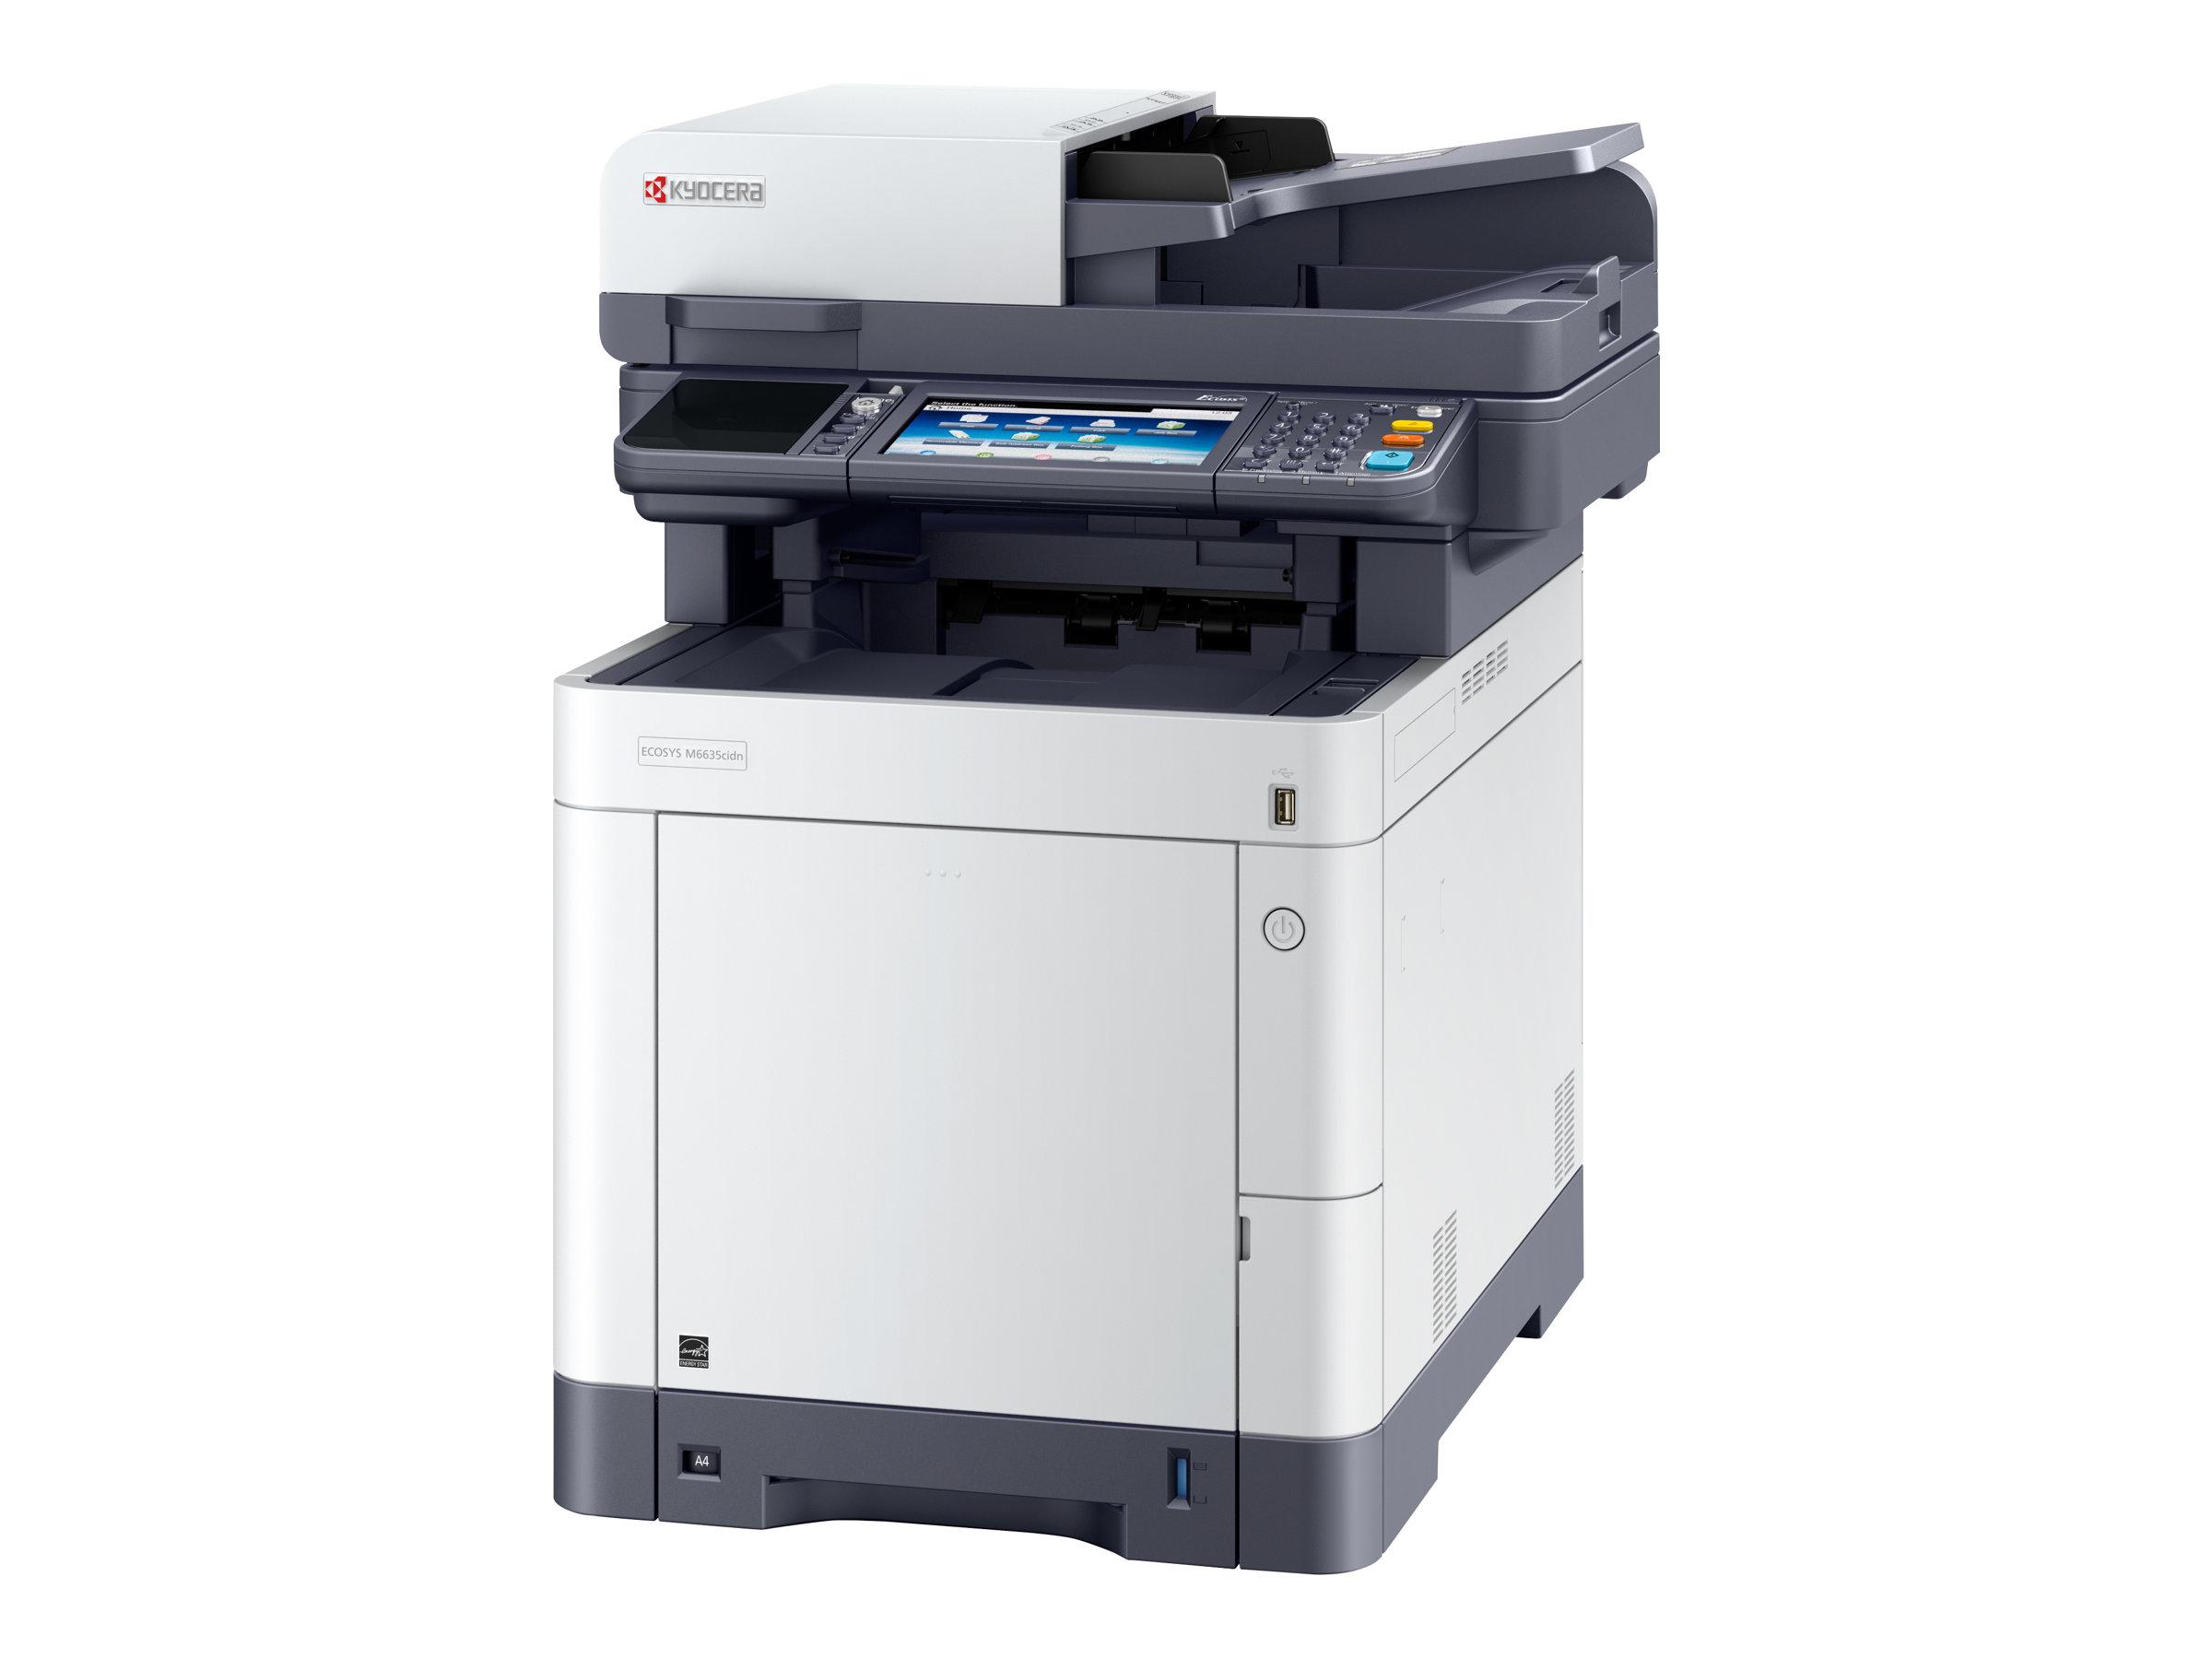 Kyocera ECOSYS M6635cidn - Multifunktionsdrucker - Farbe - Laser - Legal (216 x 356 mm)/A4 (210 x 297 mm) (Original) - A4/Legal